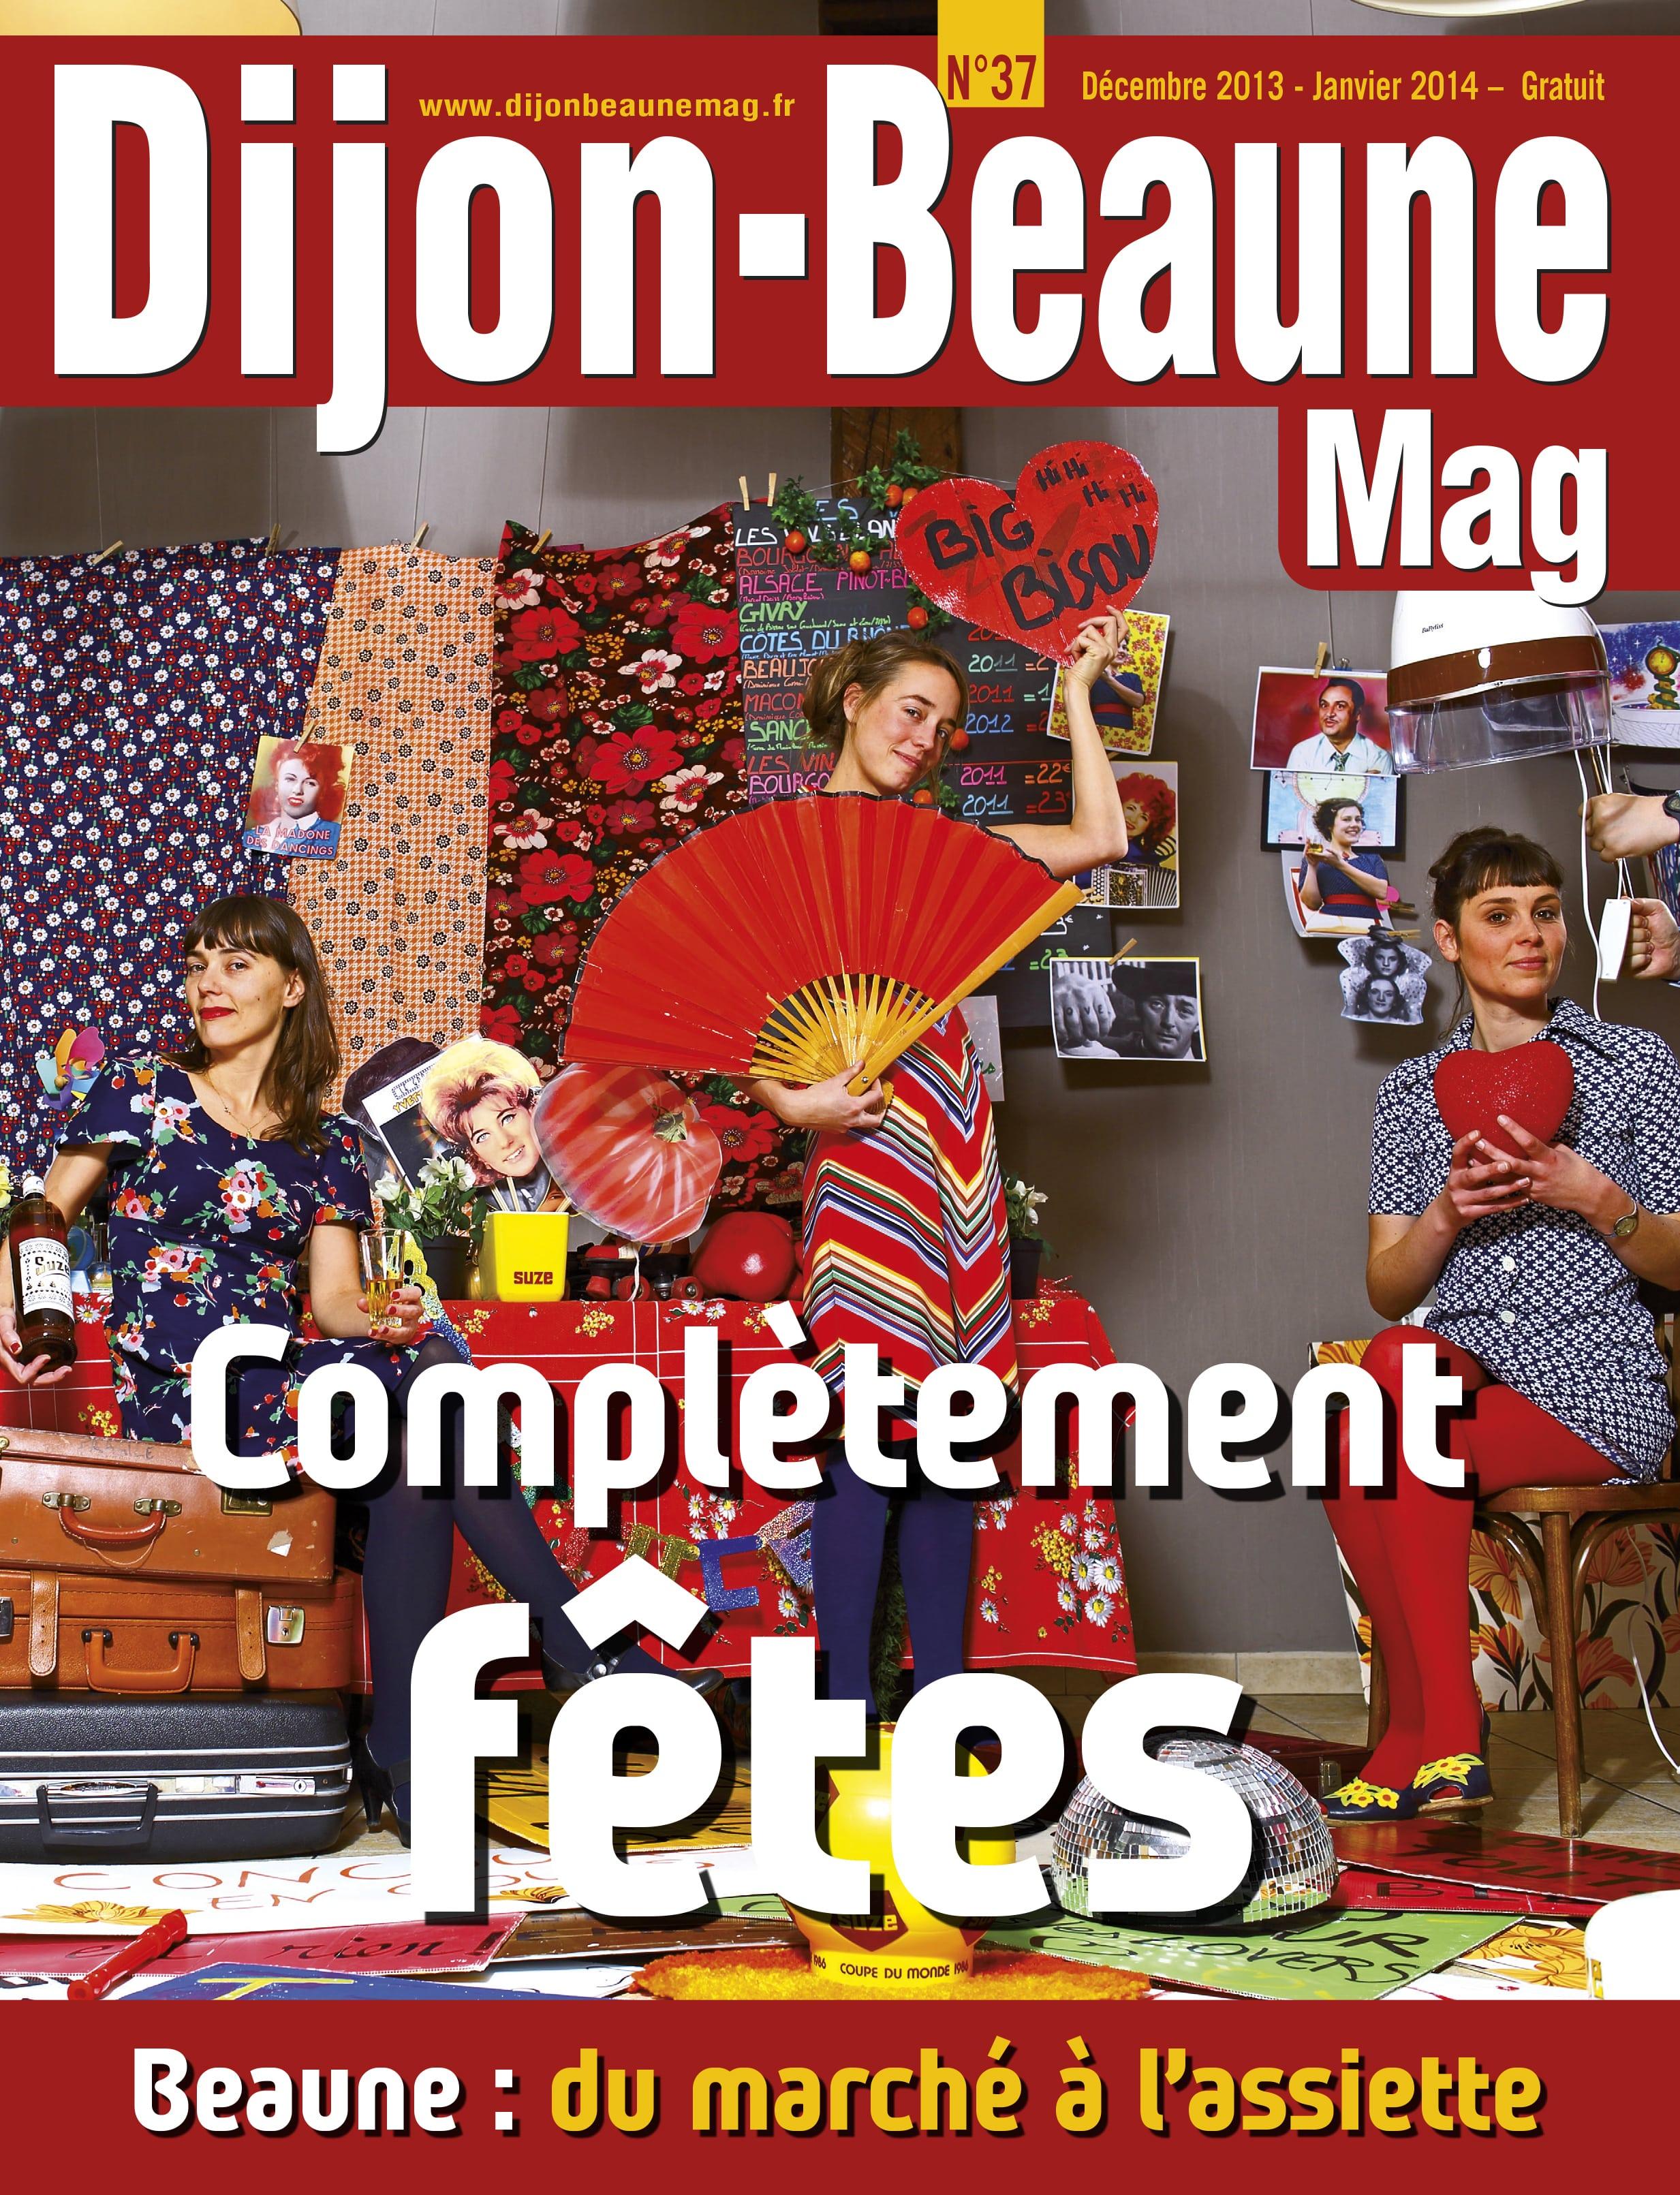 Dijon-Beaune Mag n°37